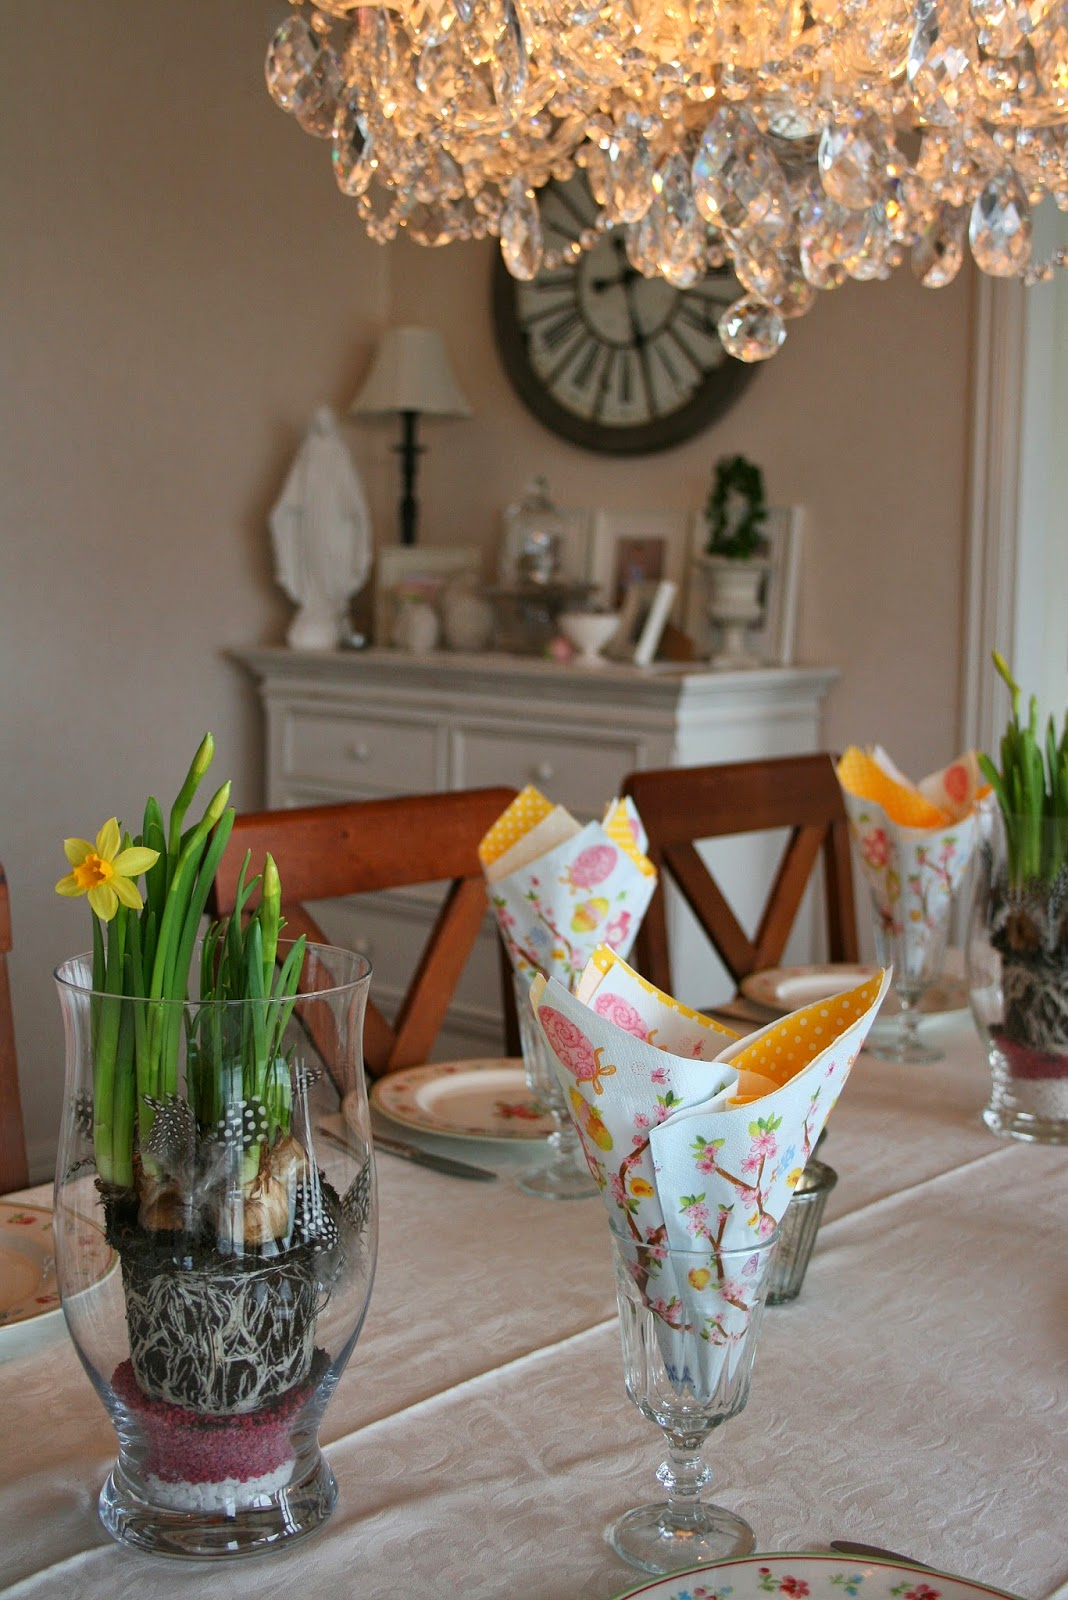 blomsteroppsatser til påske